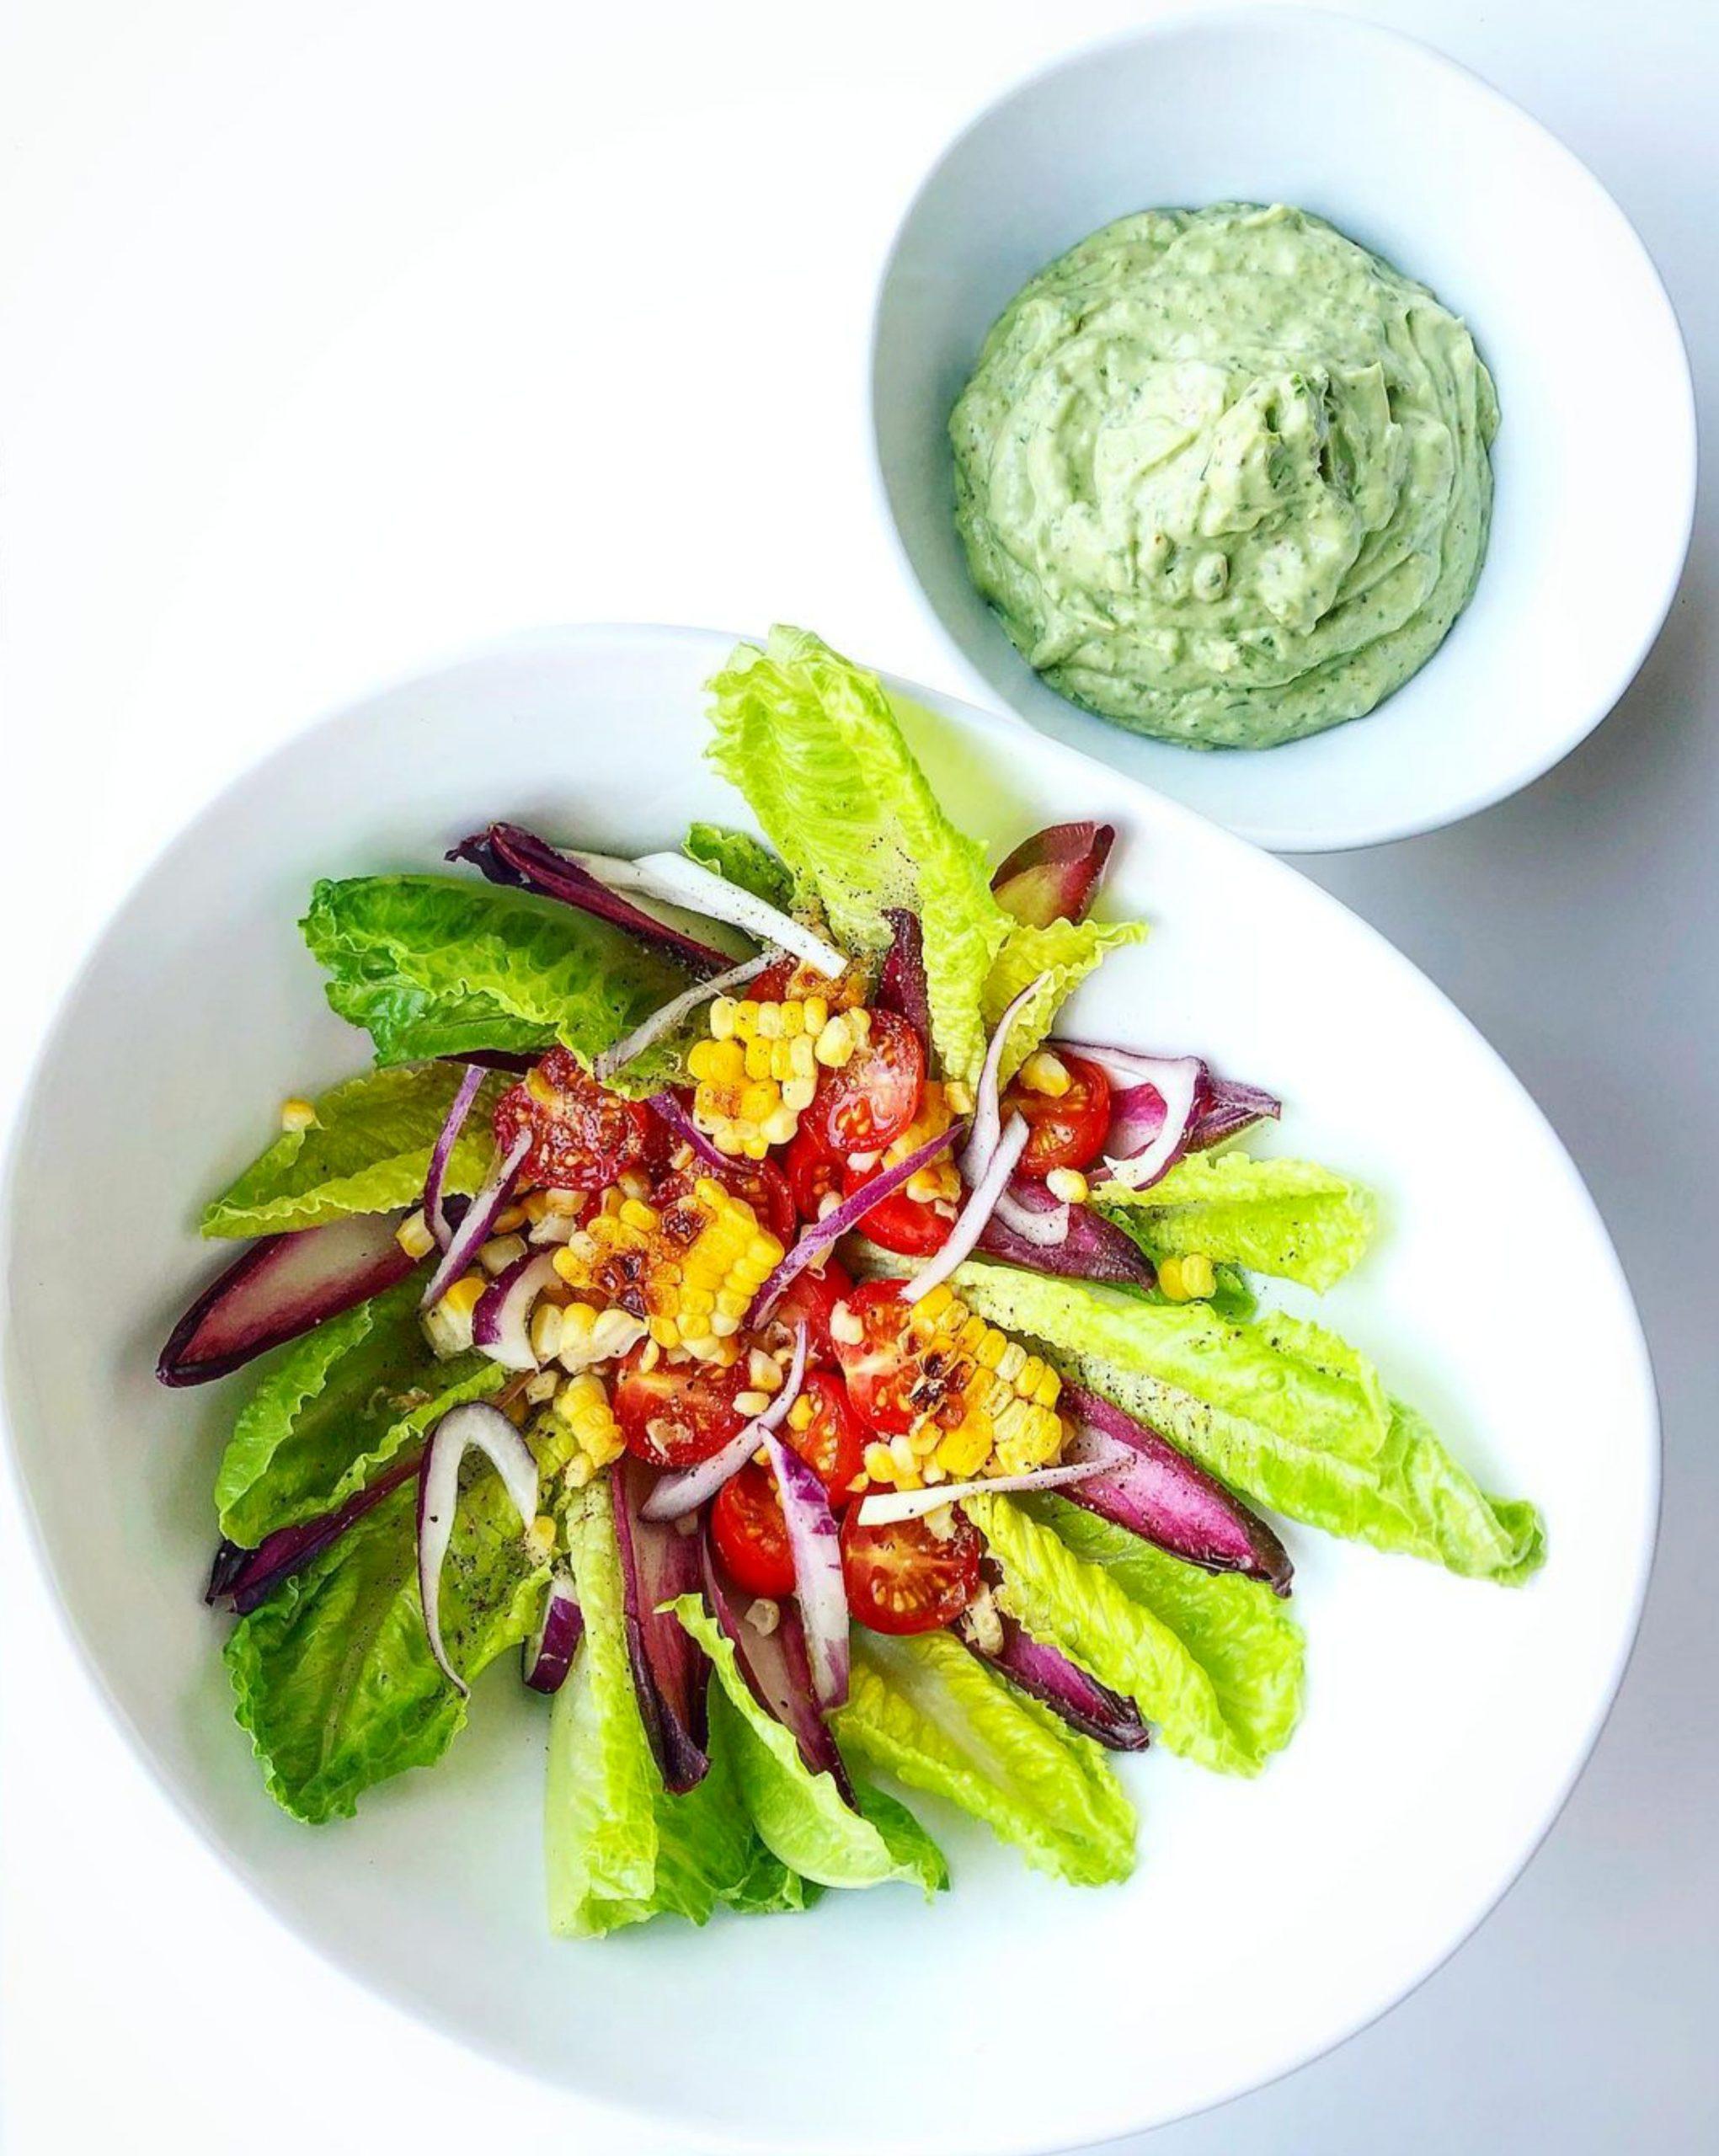 A vegetarian food dish